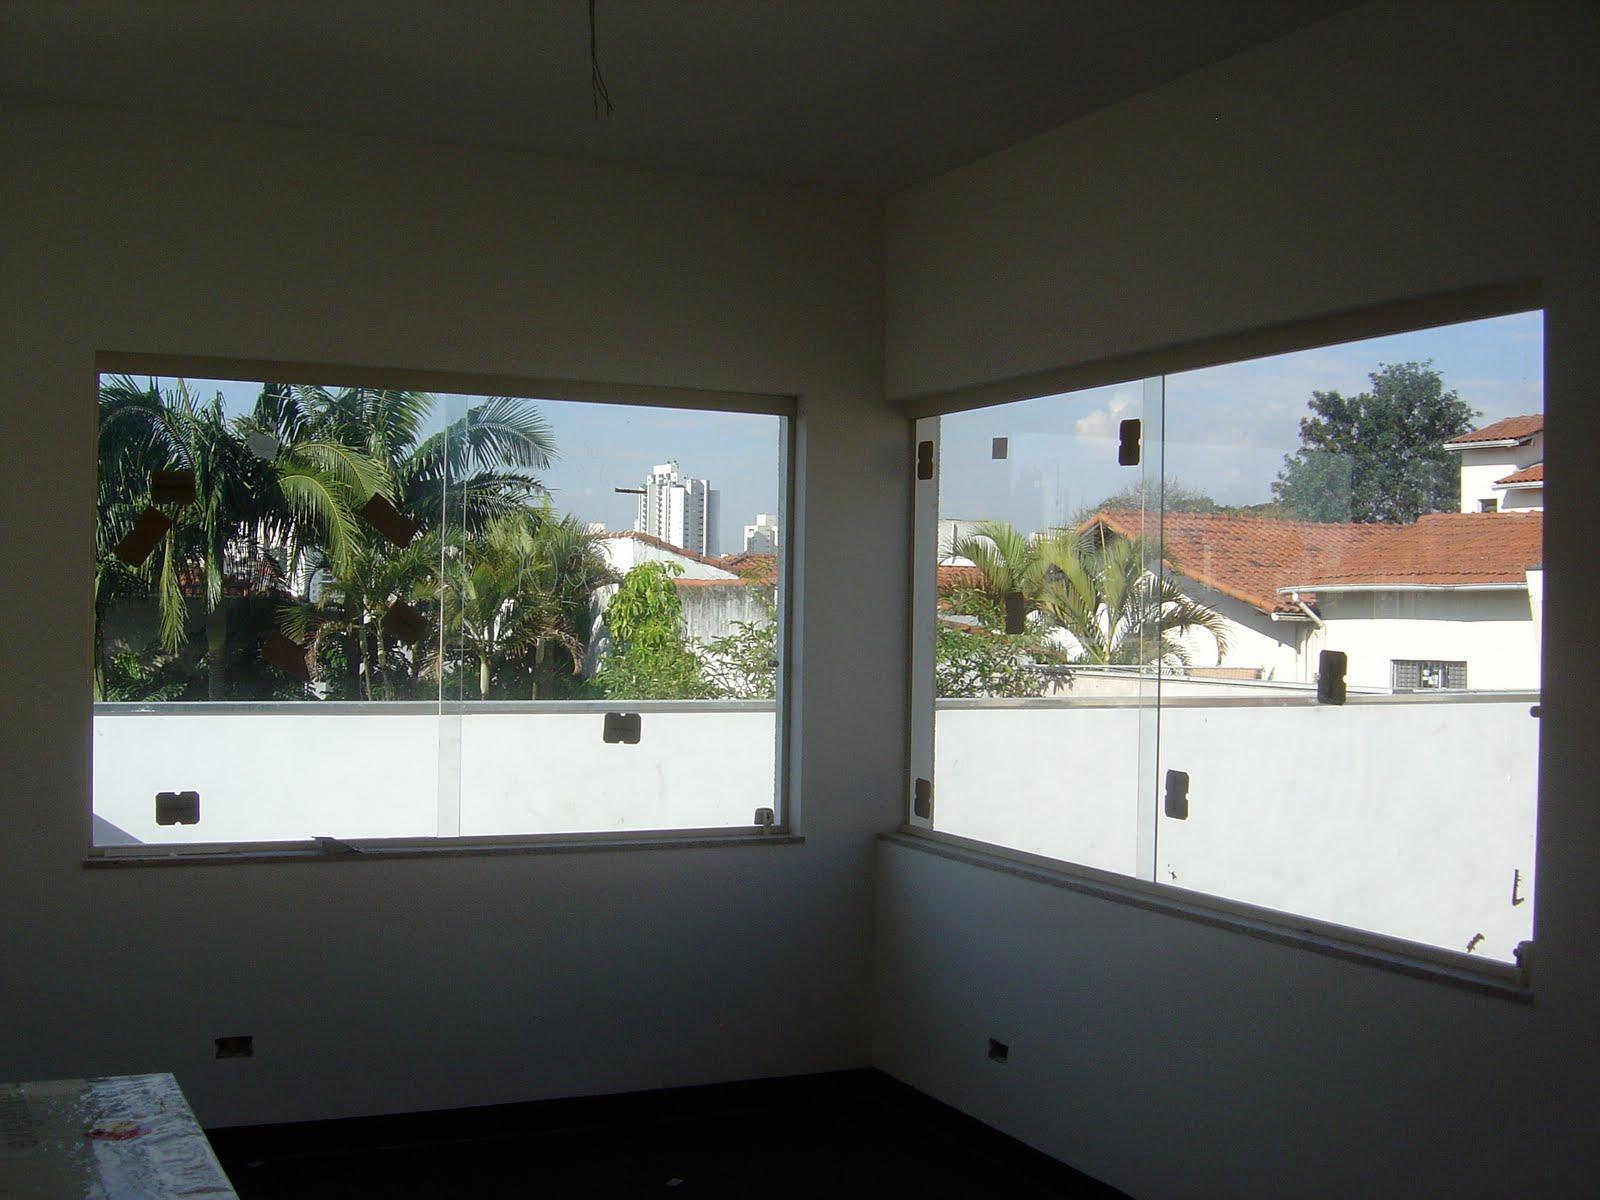 #875B44 Casa Anderson: da visita de 20/7 janelas de vidro 428 Janelas De Vidros Para Cozinha